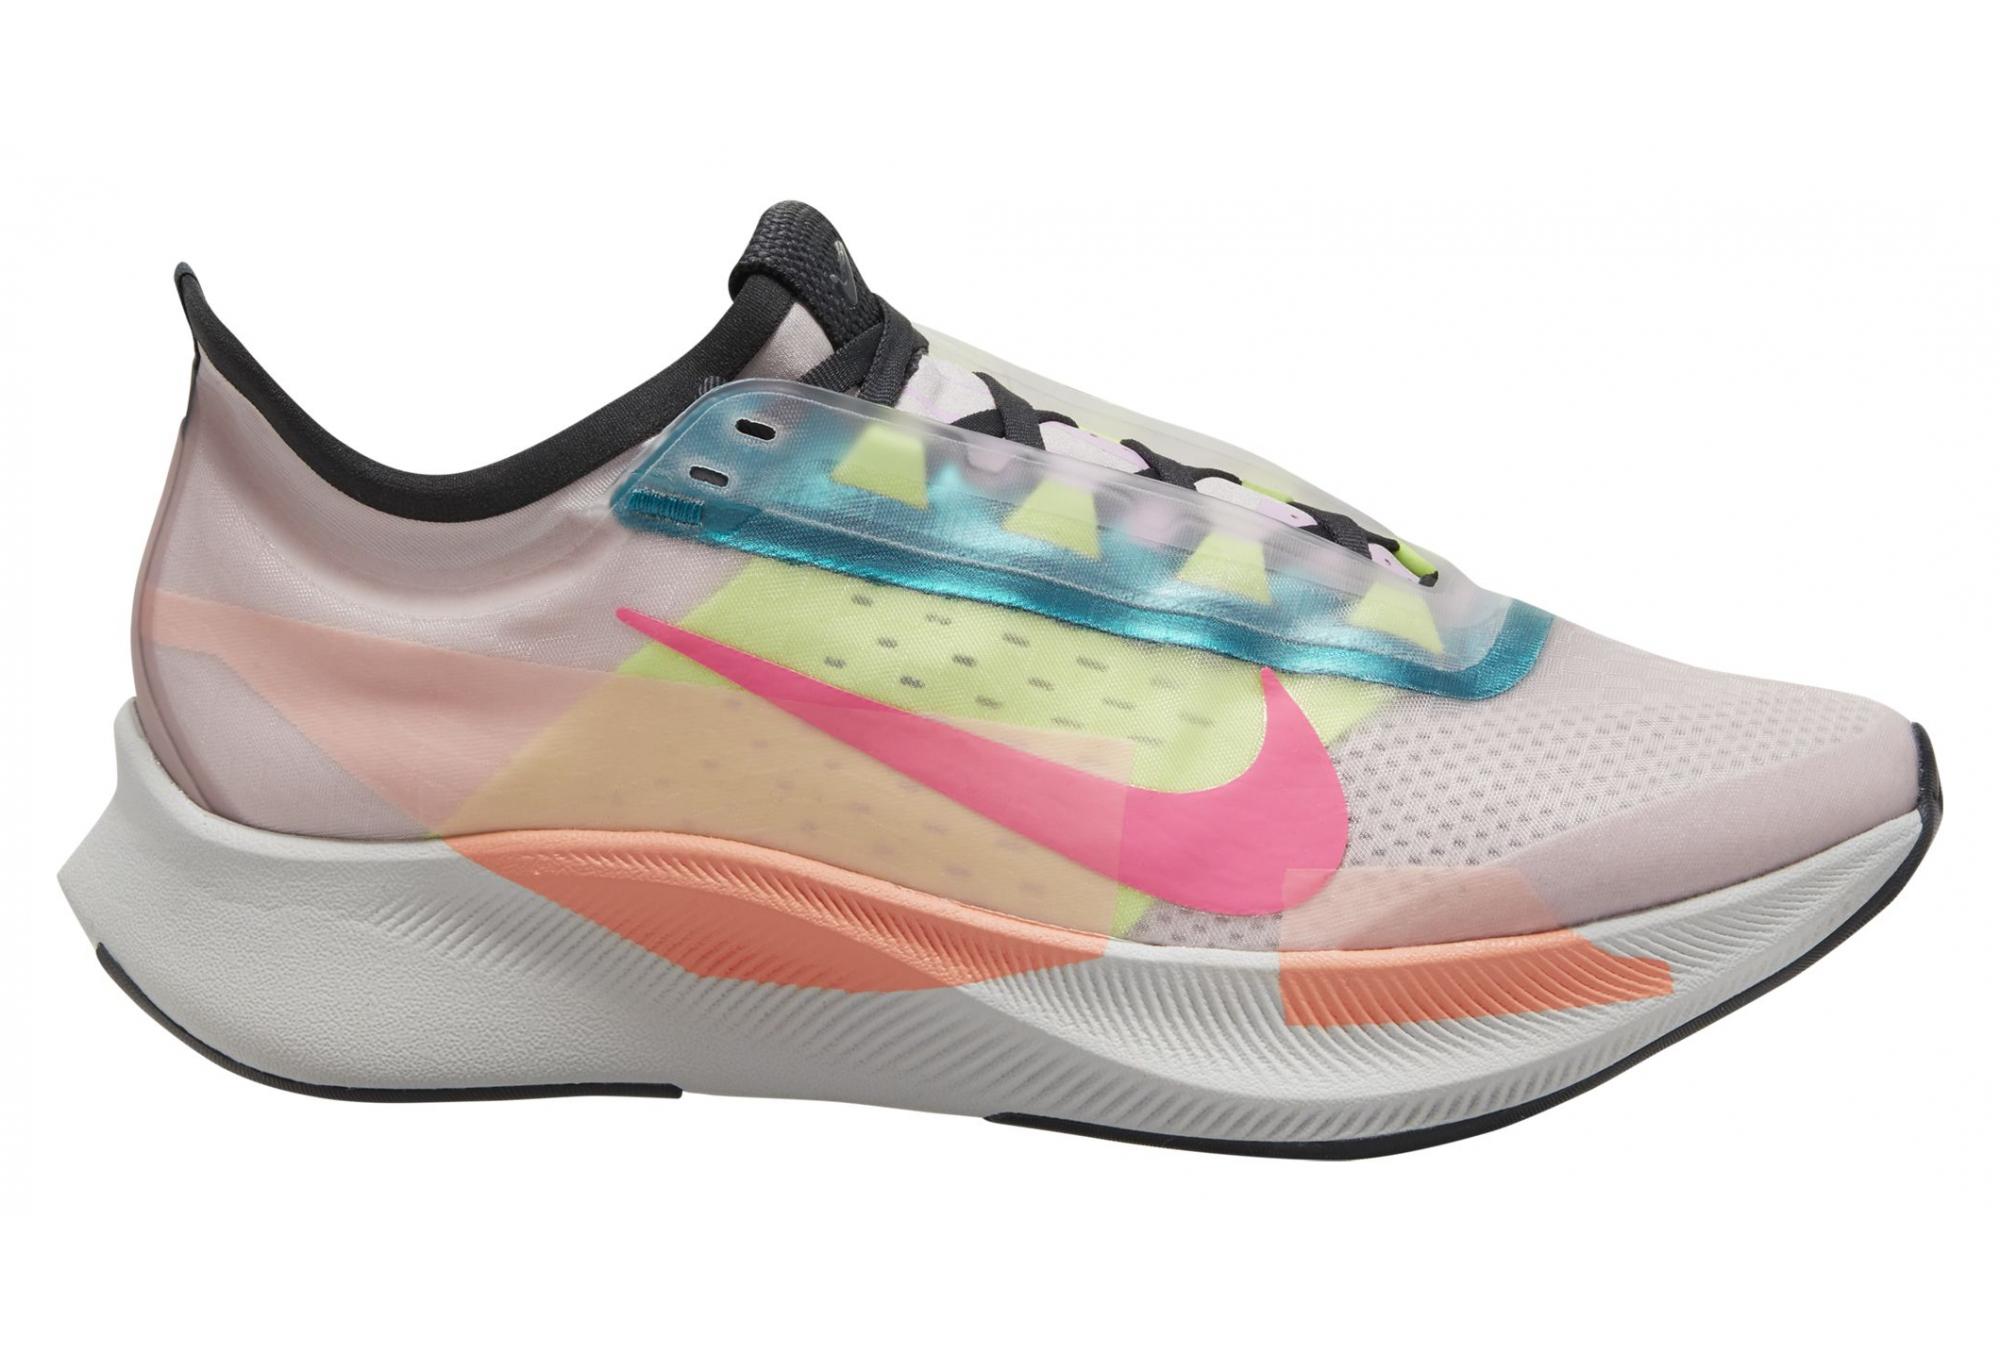 Chaussures de Running Femme Nike Zoom Fly 3 Premium Rose / Multi ...